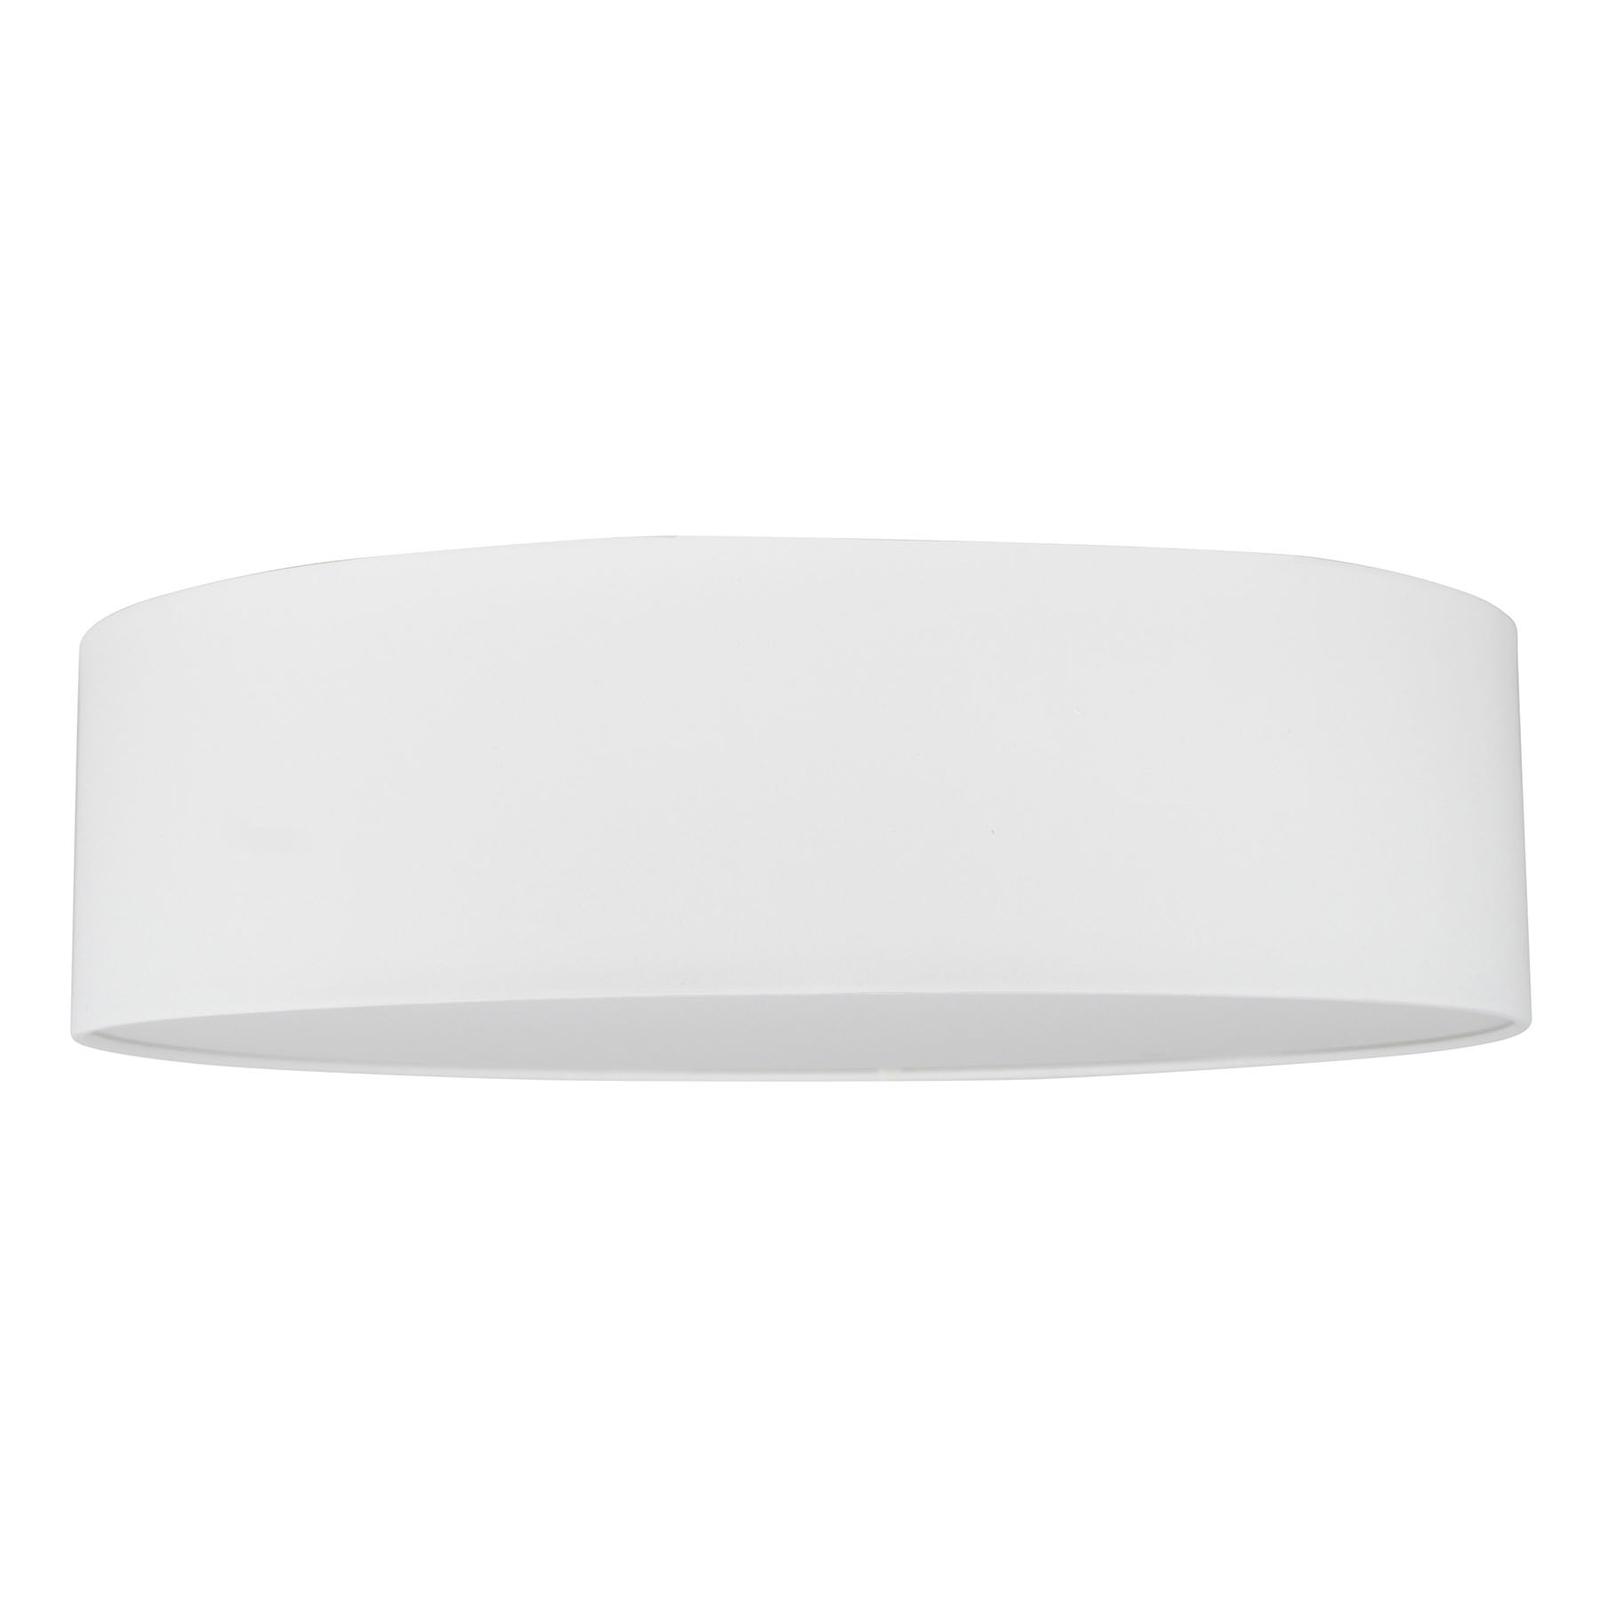 Lampa sufitowa LED Josefina, Ø 48 cm, biała